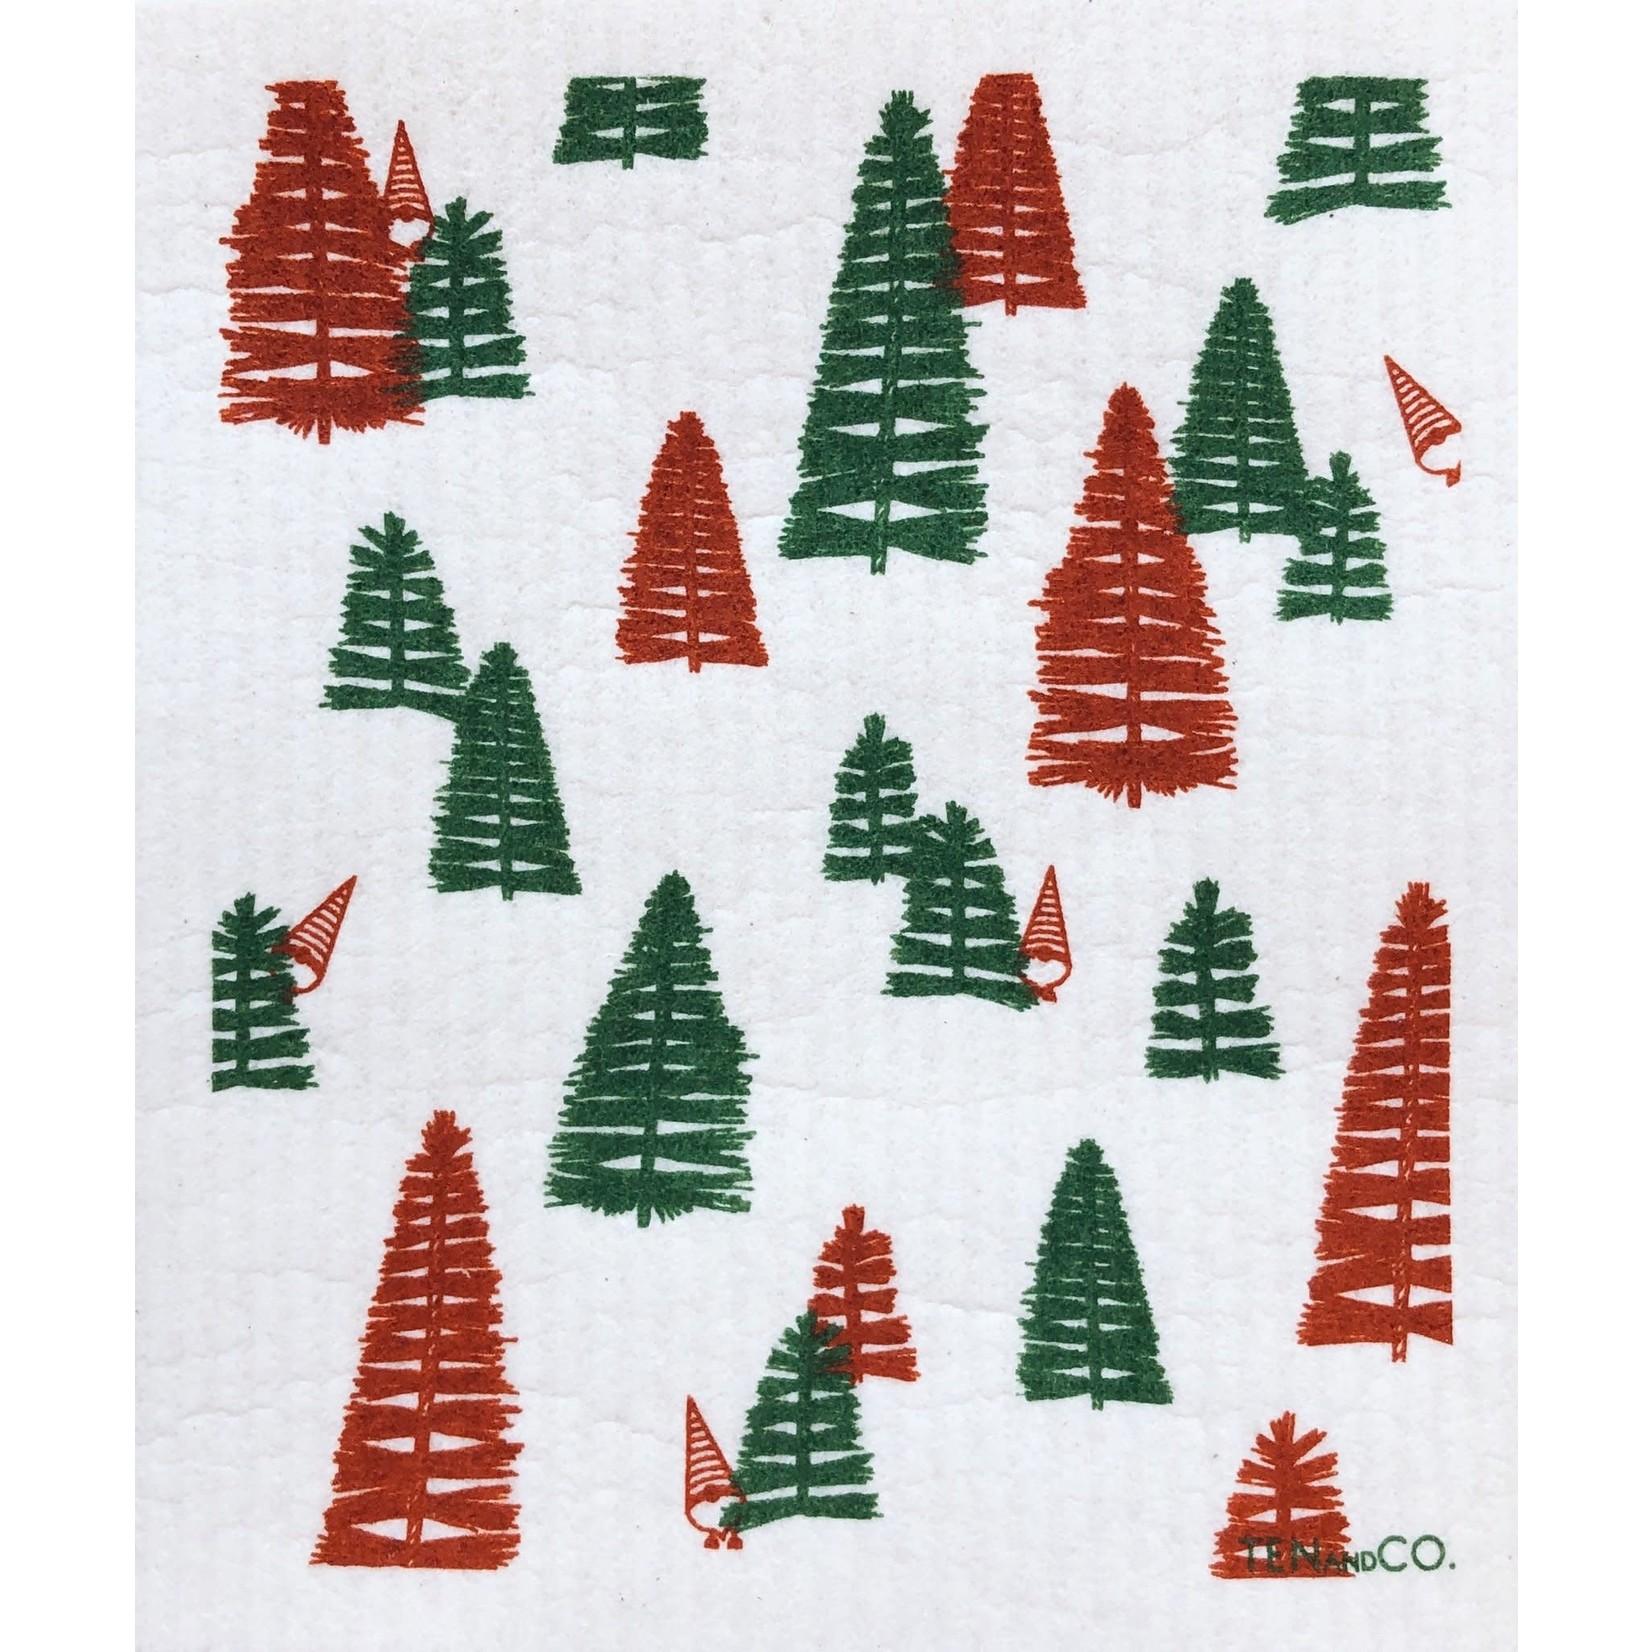 TEN AND CO. Sponge Cloth Woods Rust Red + Green